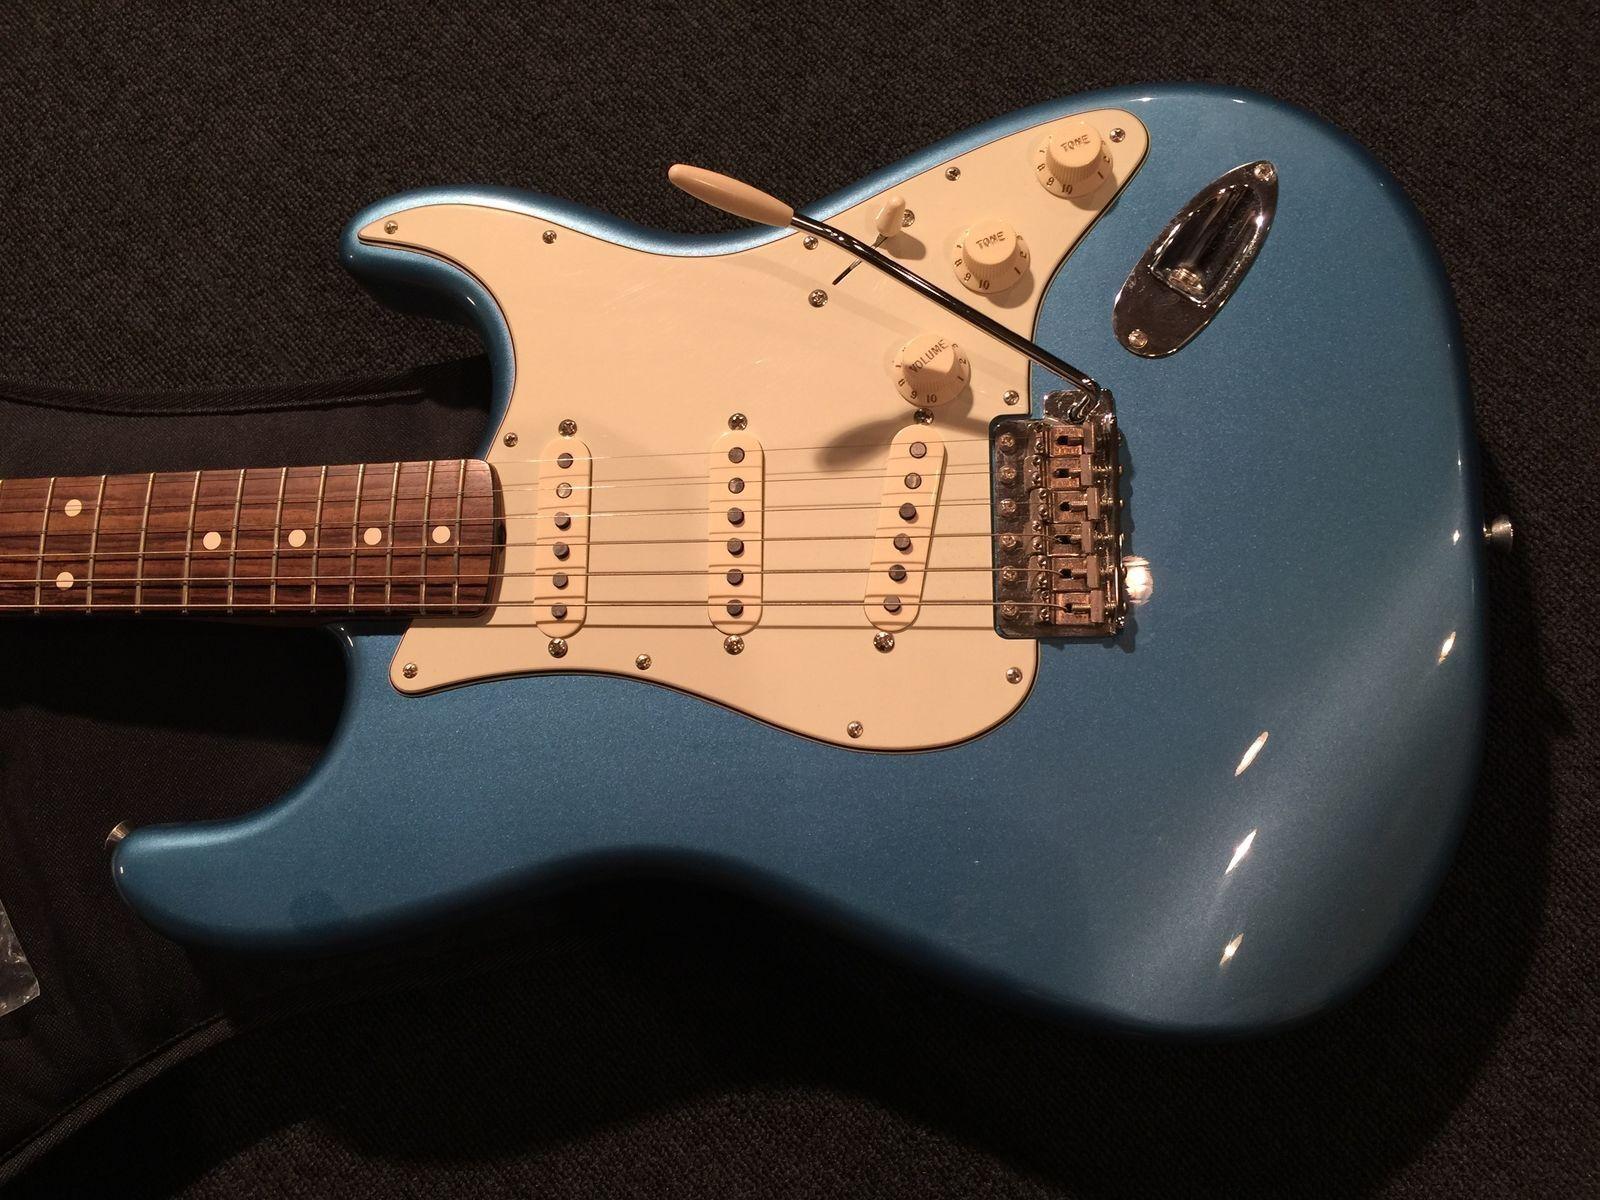 Fender MEX '60ST CLASSIC SERIES LPB/R No.081213 rare EMS F/S